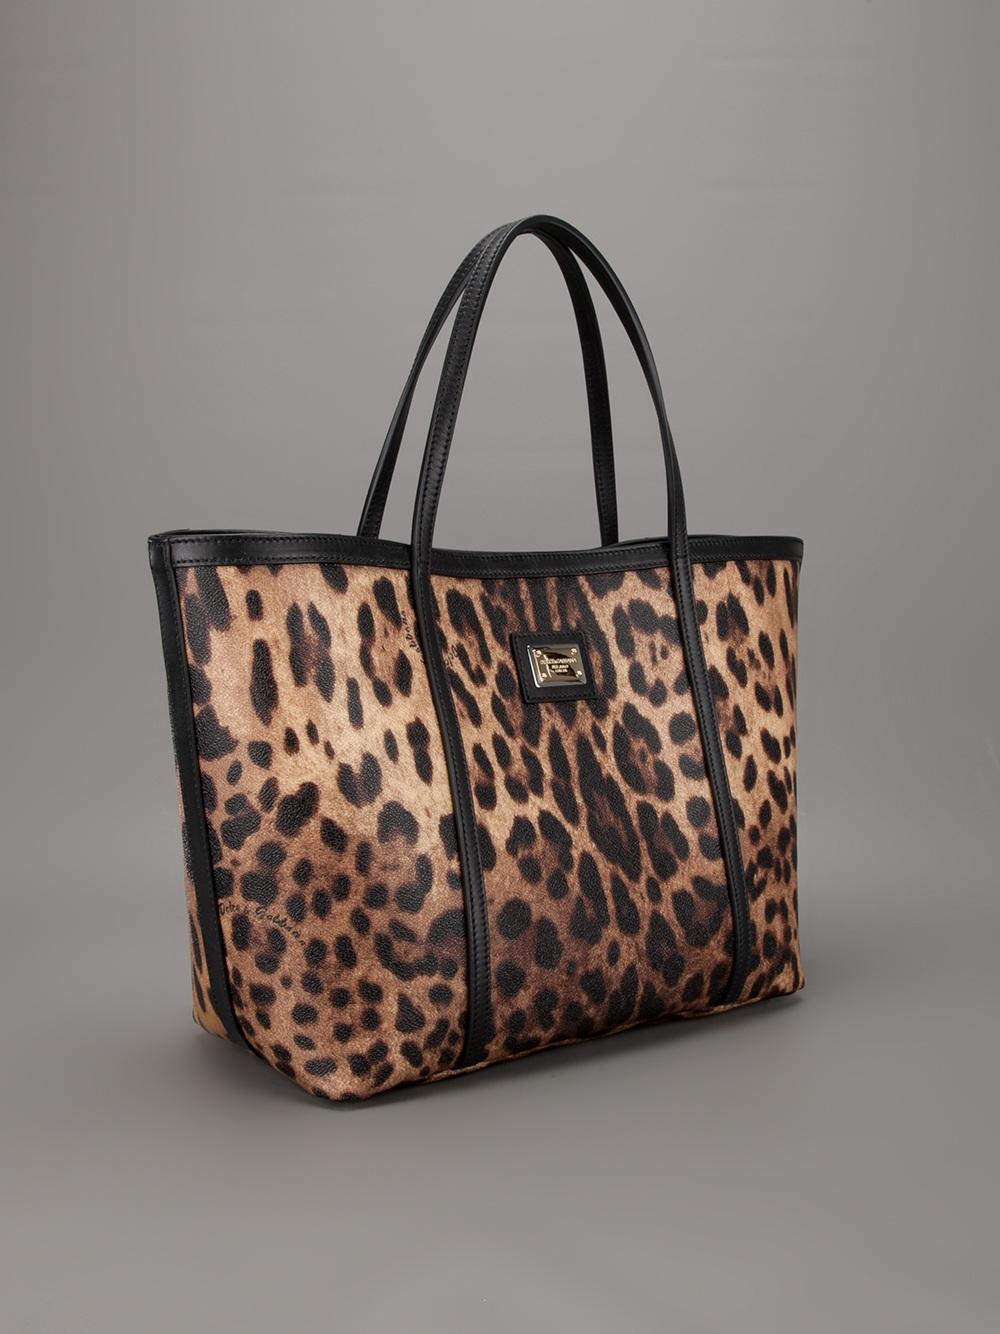 721727fd2806 Dolce & Gabbana Leopard Shopping Tote - Lyst